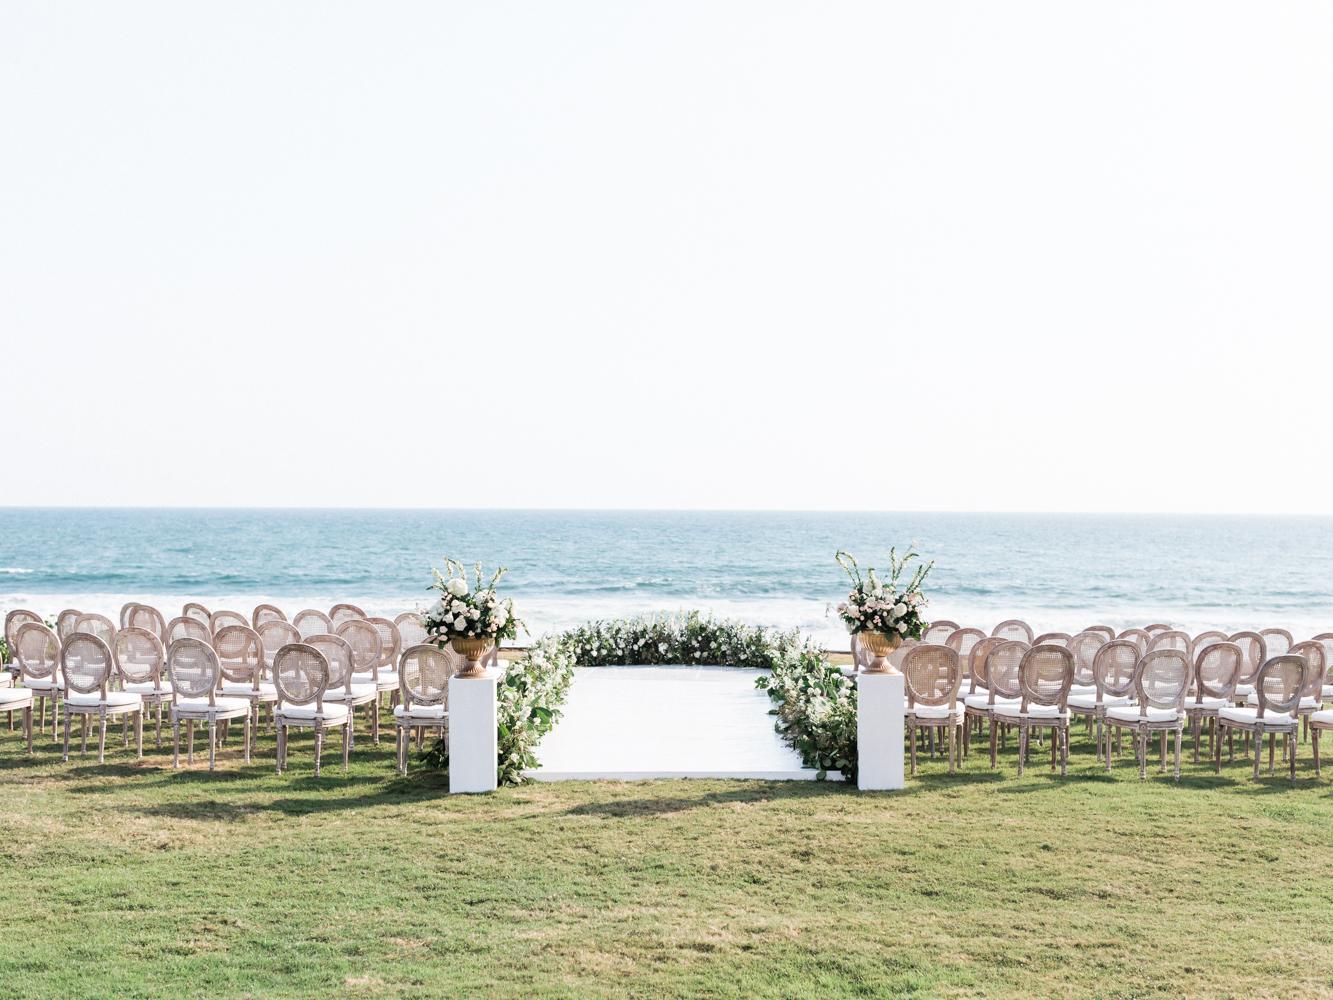 Bali_Real_Wedding_(c)_Rory_Wylie-59.jpg